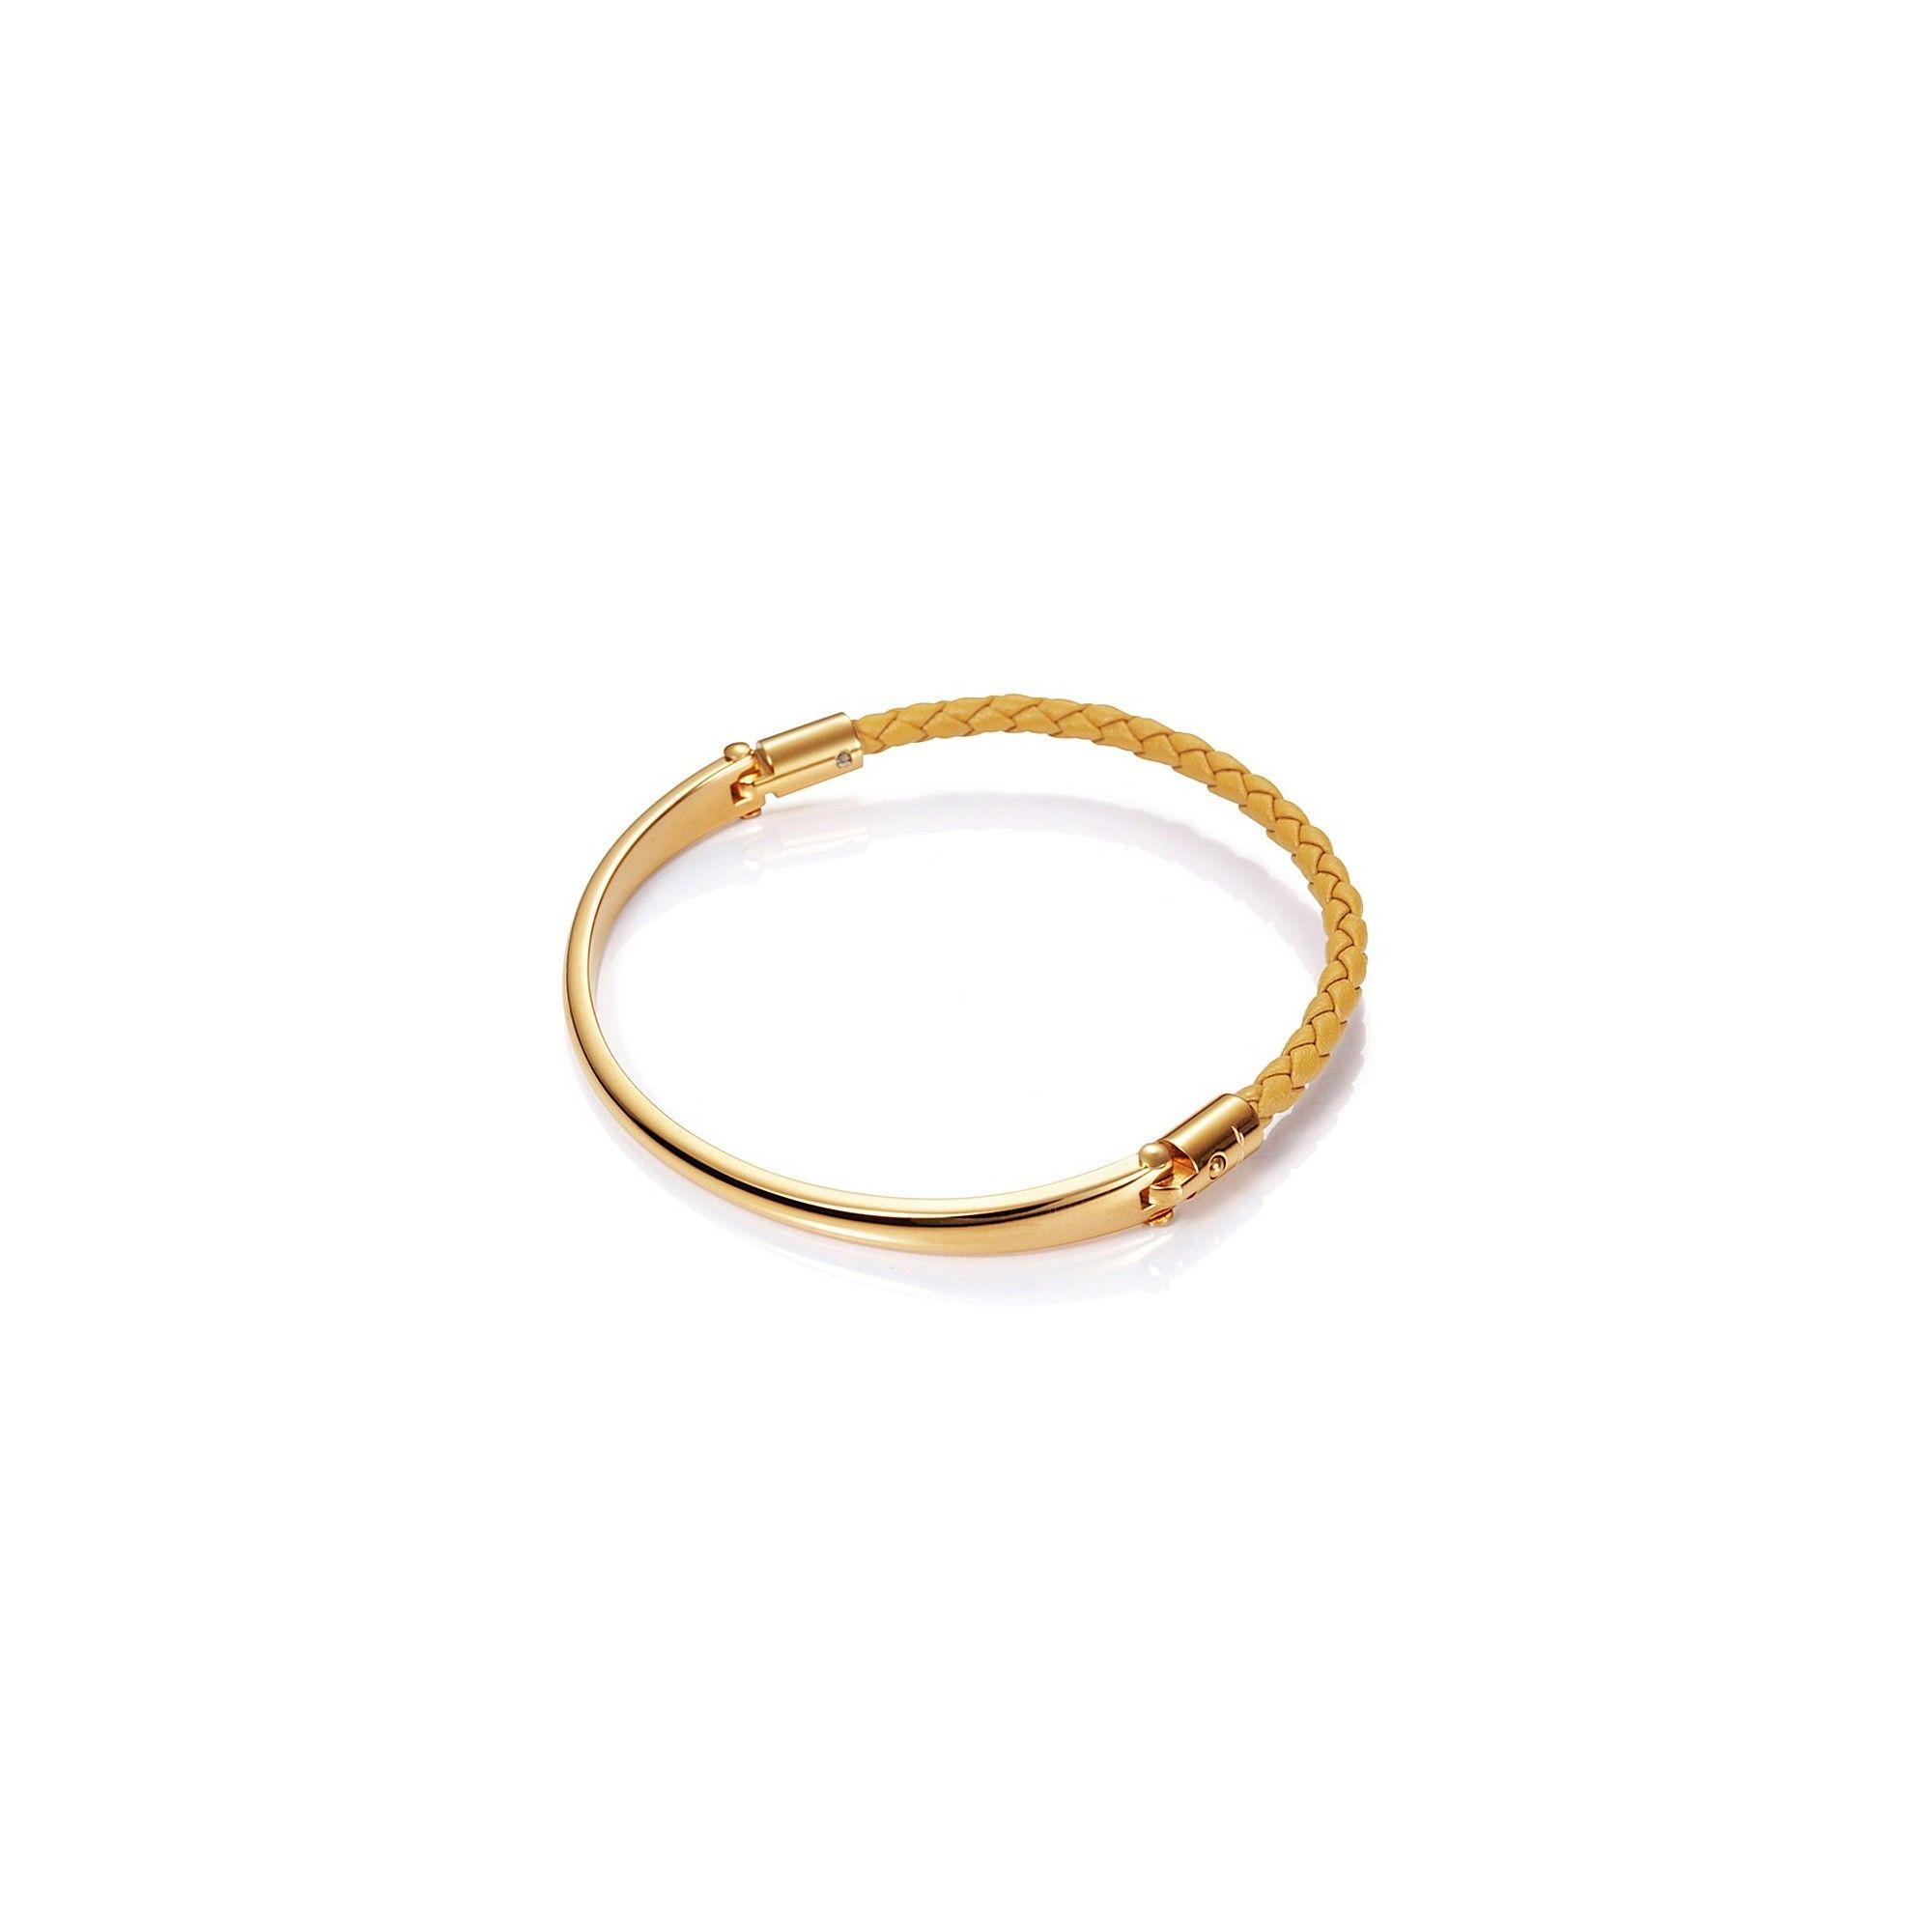 Женский браслет Viceroy Antonio Banderas Design 75032P01012